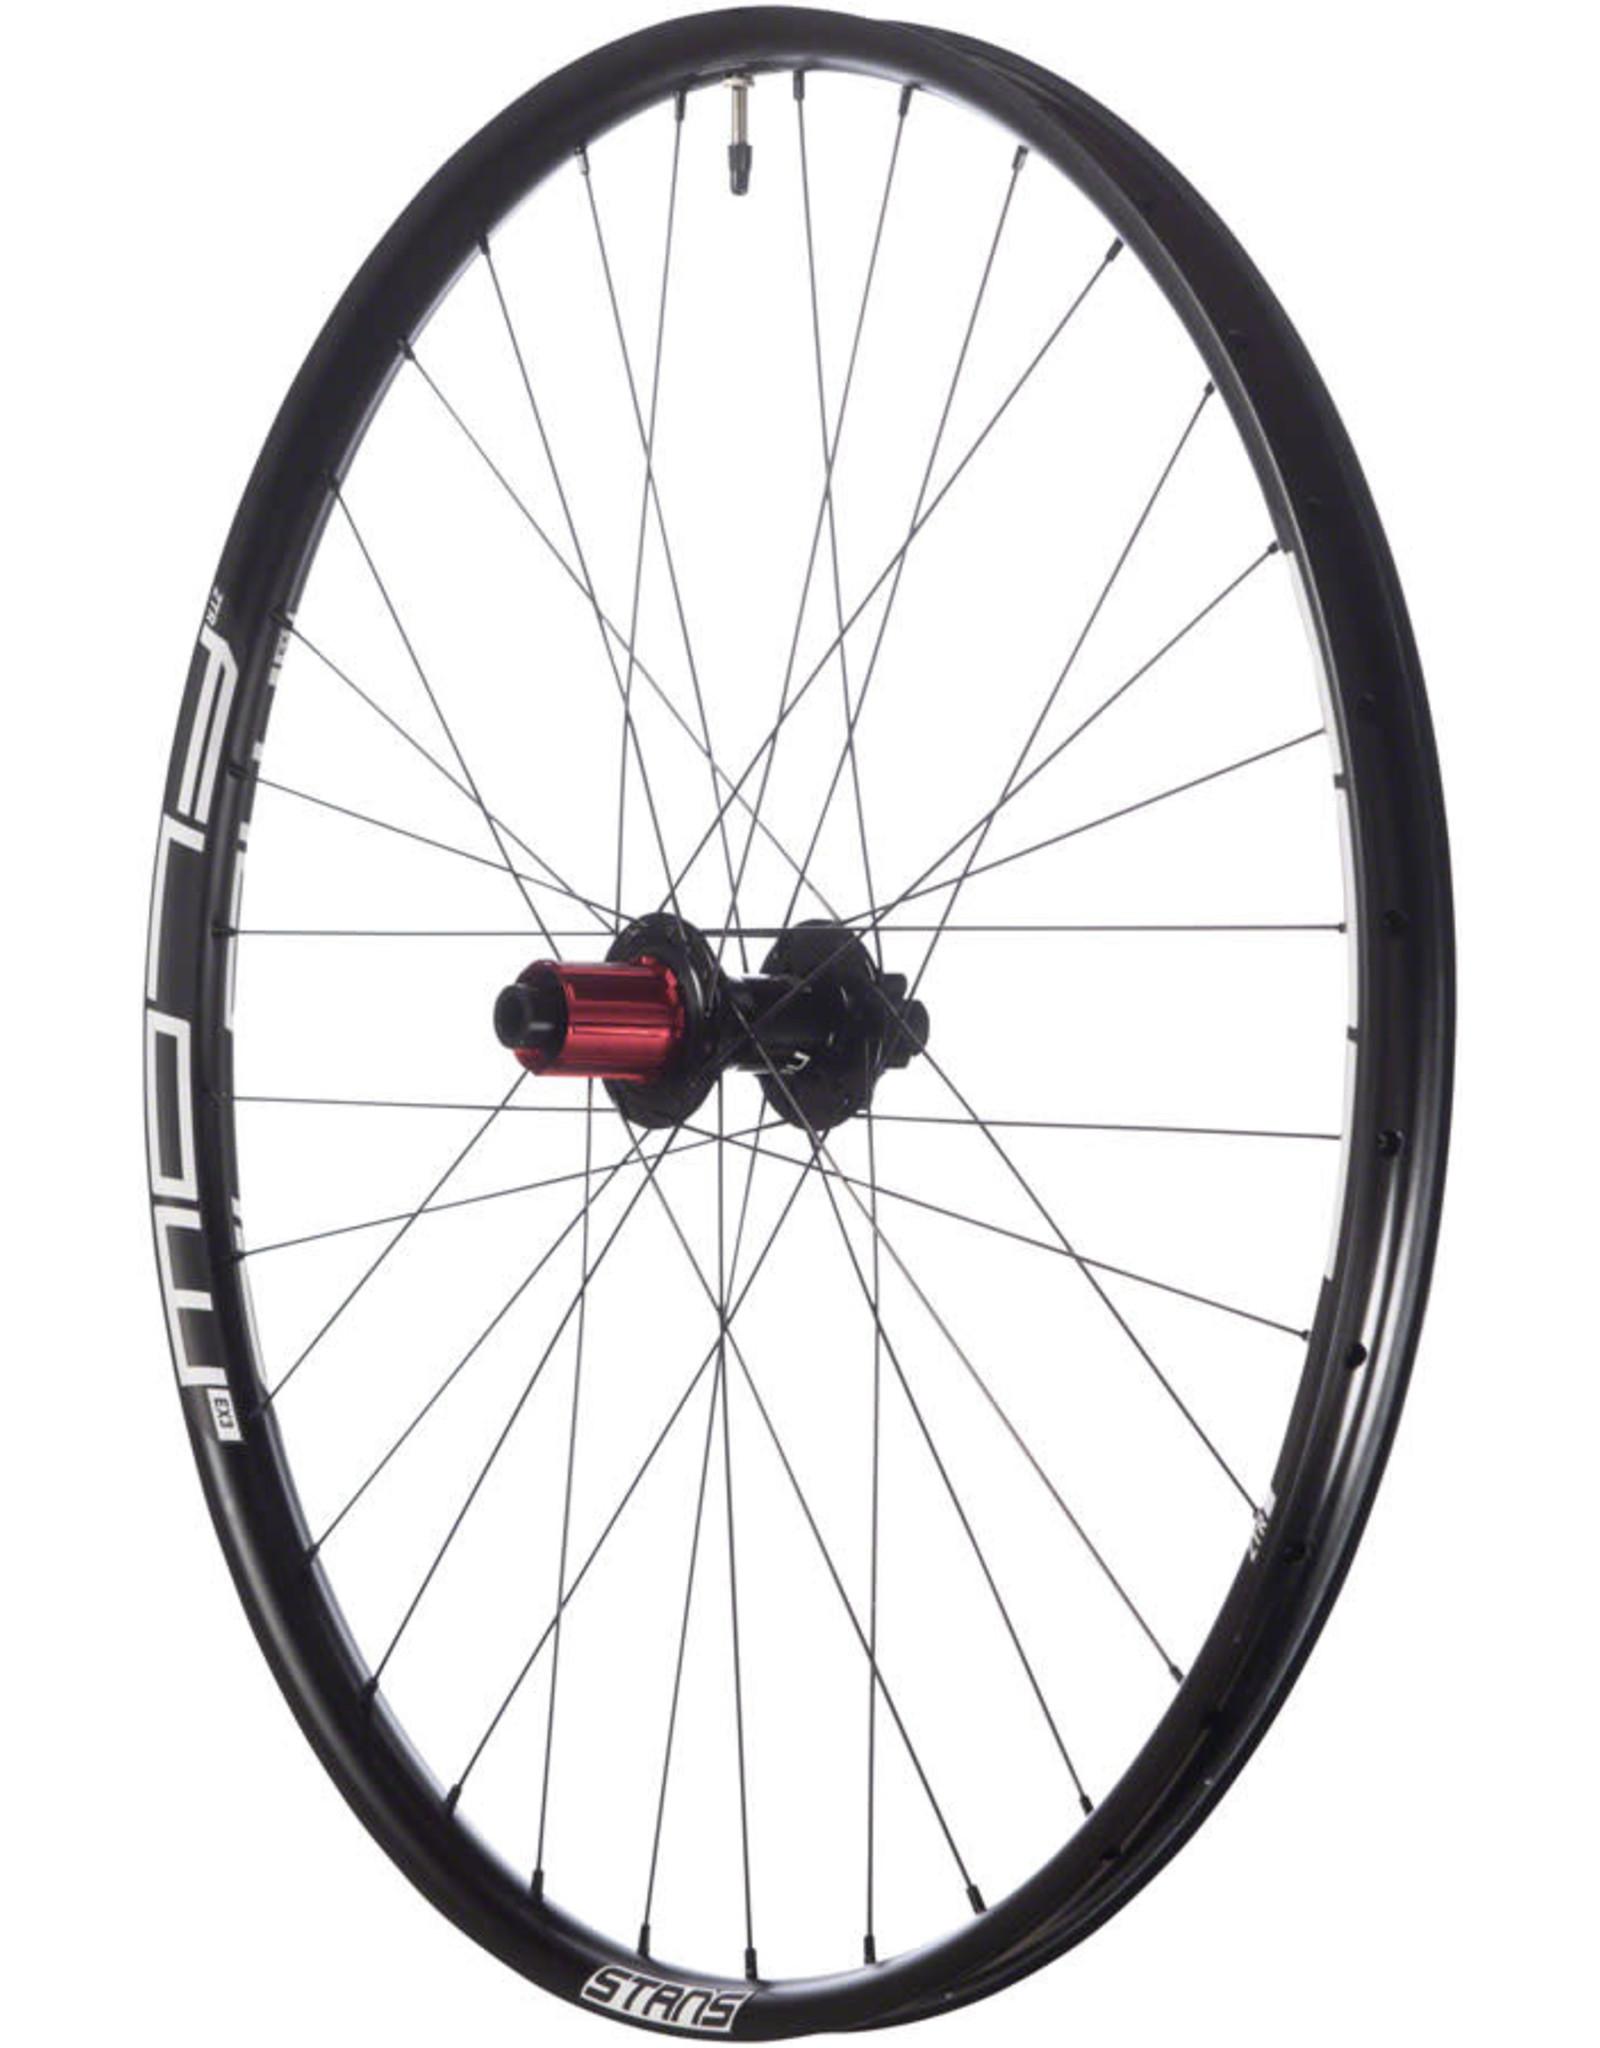 "Stan's No Tubes Stan's No Tubes Flow EX3 Rear Wheel - 29"", 12 x 148mm Boost, 6-Bolt, HG 11, Black"